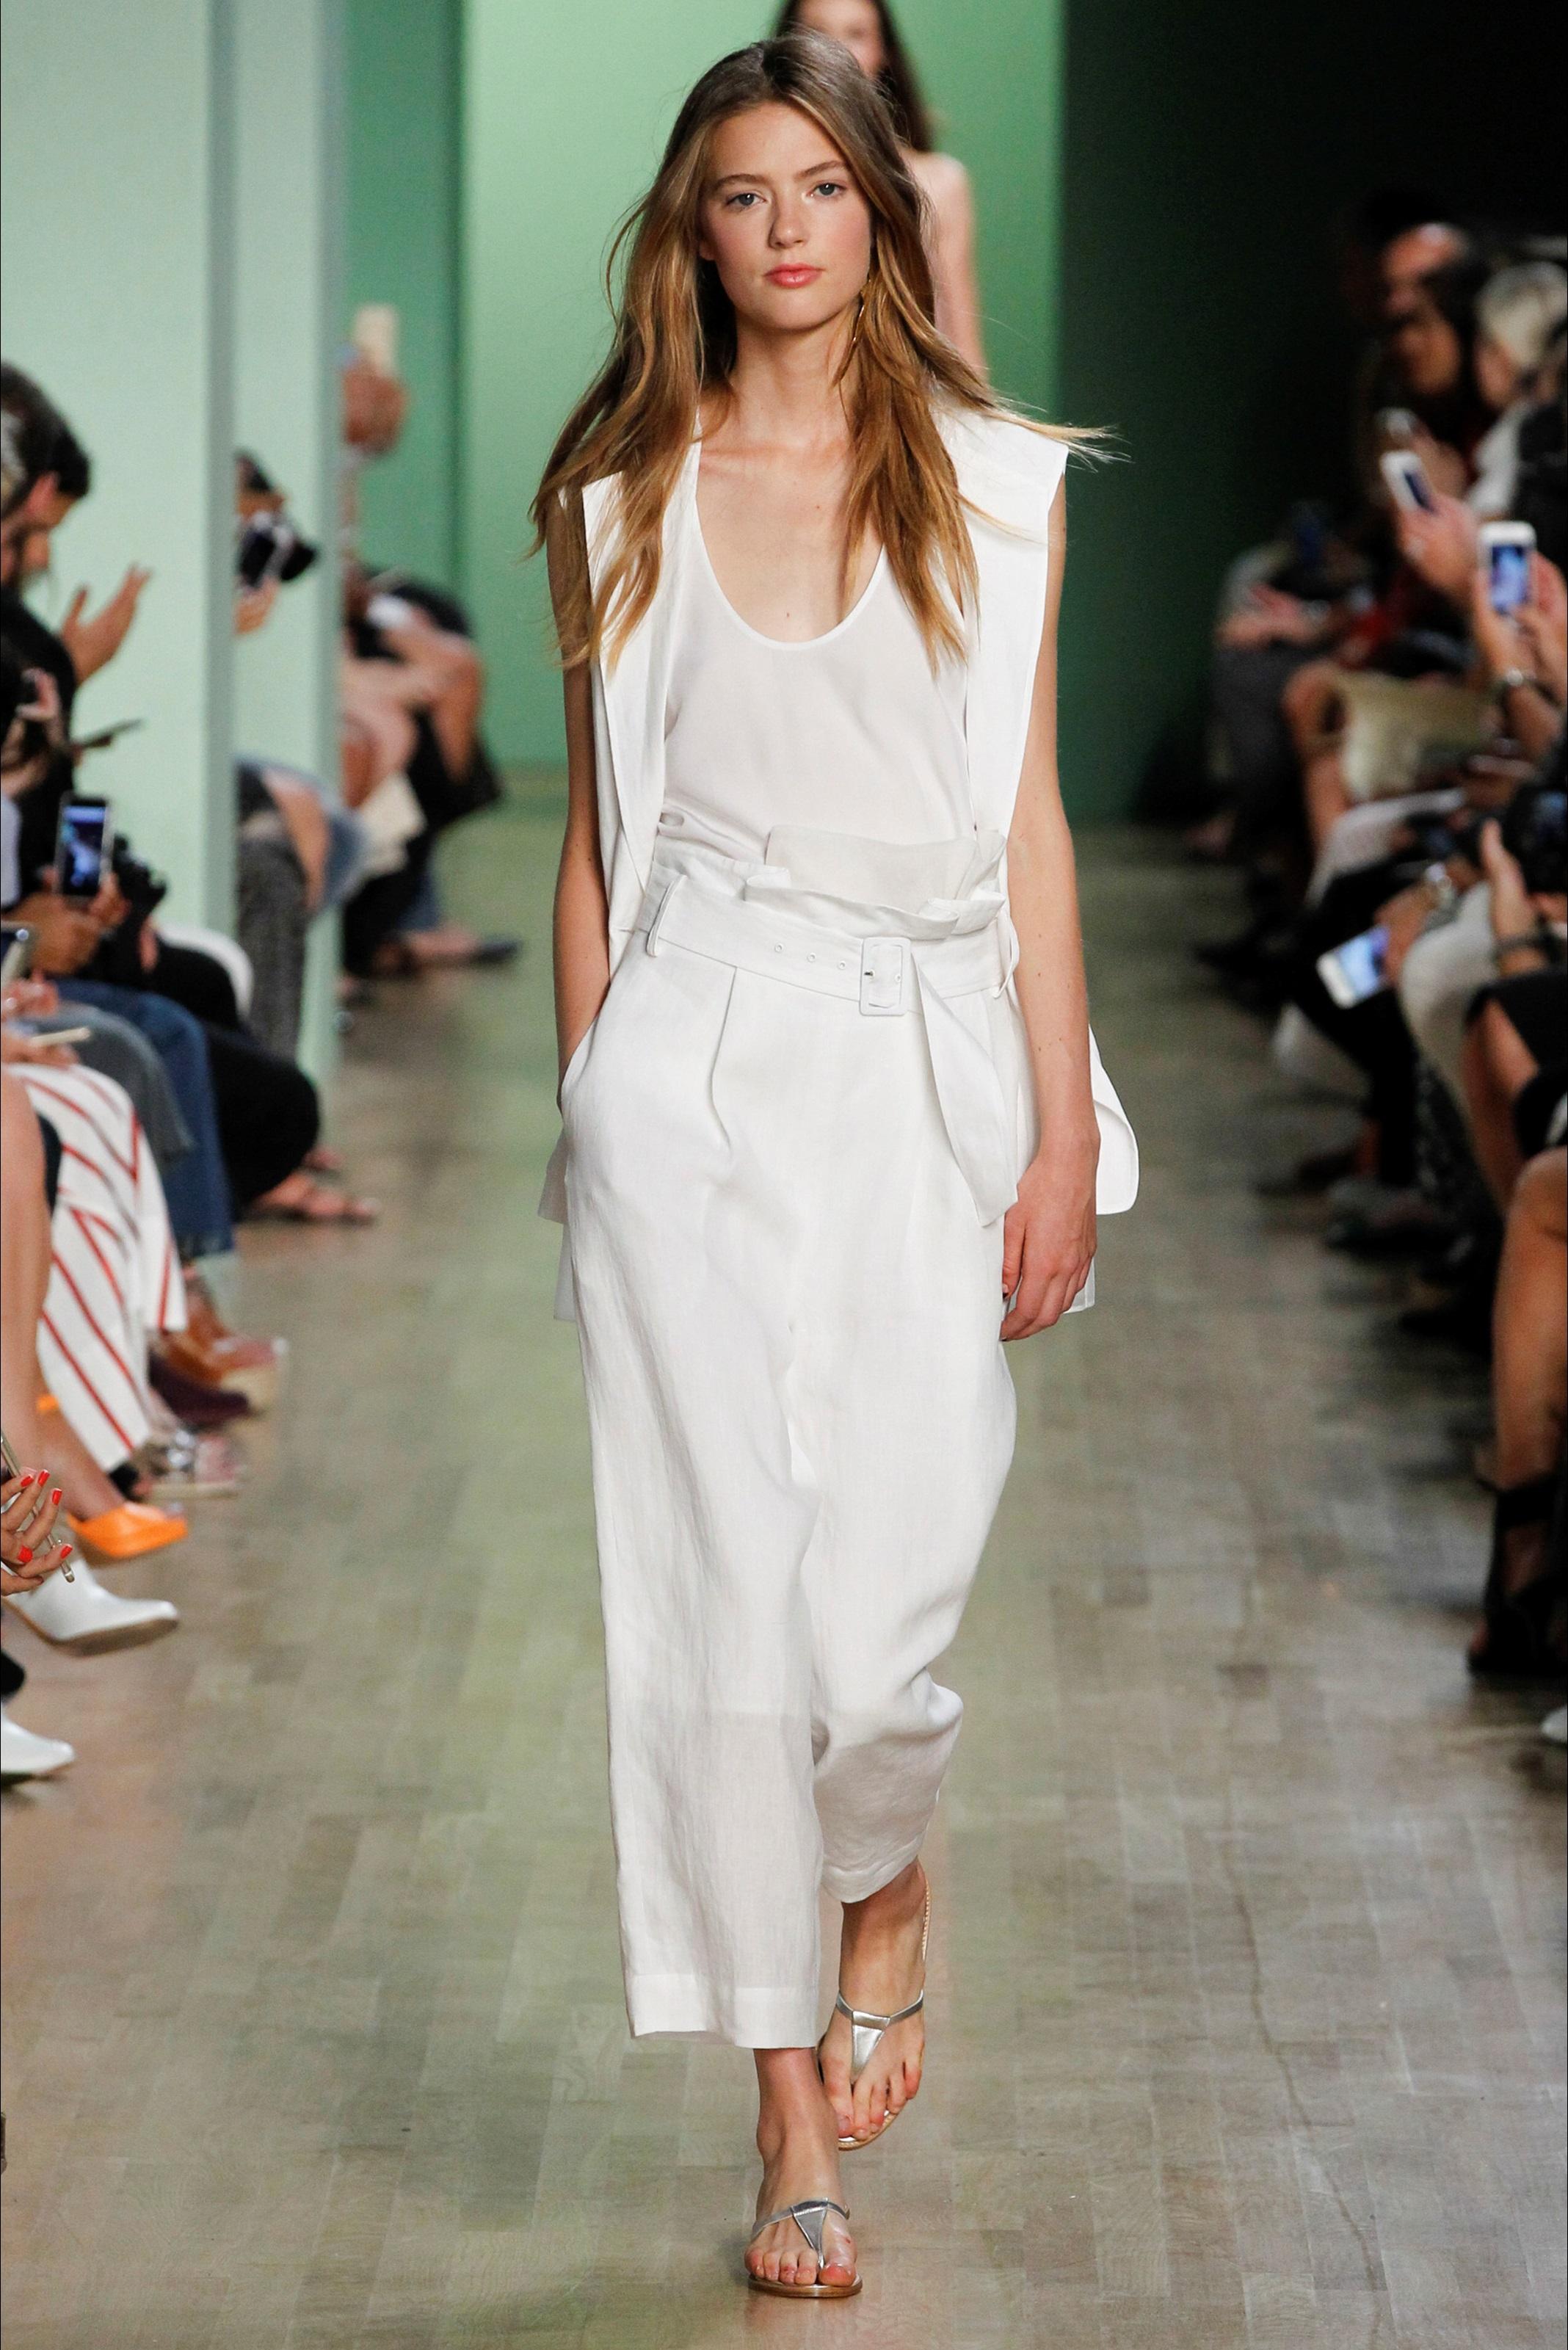 The White Code Carla Gozzi Style Coach Fashion Magazine